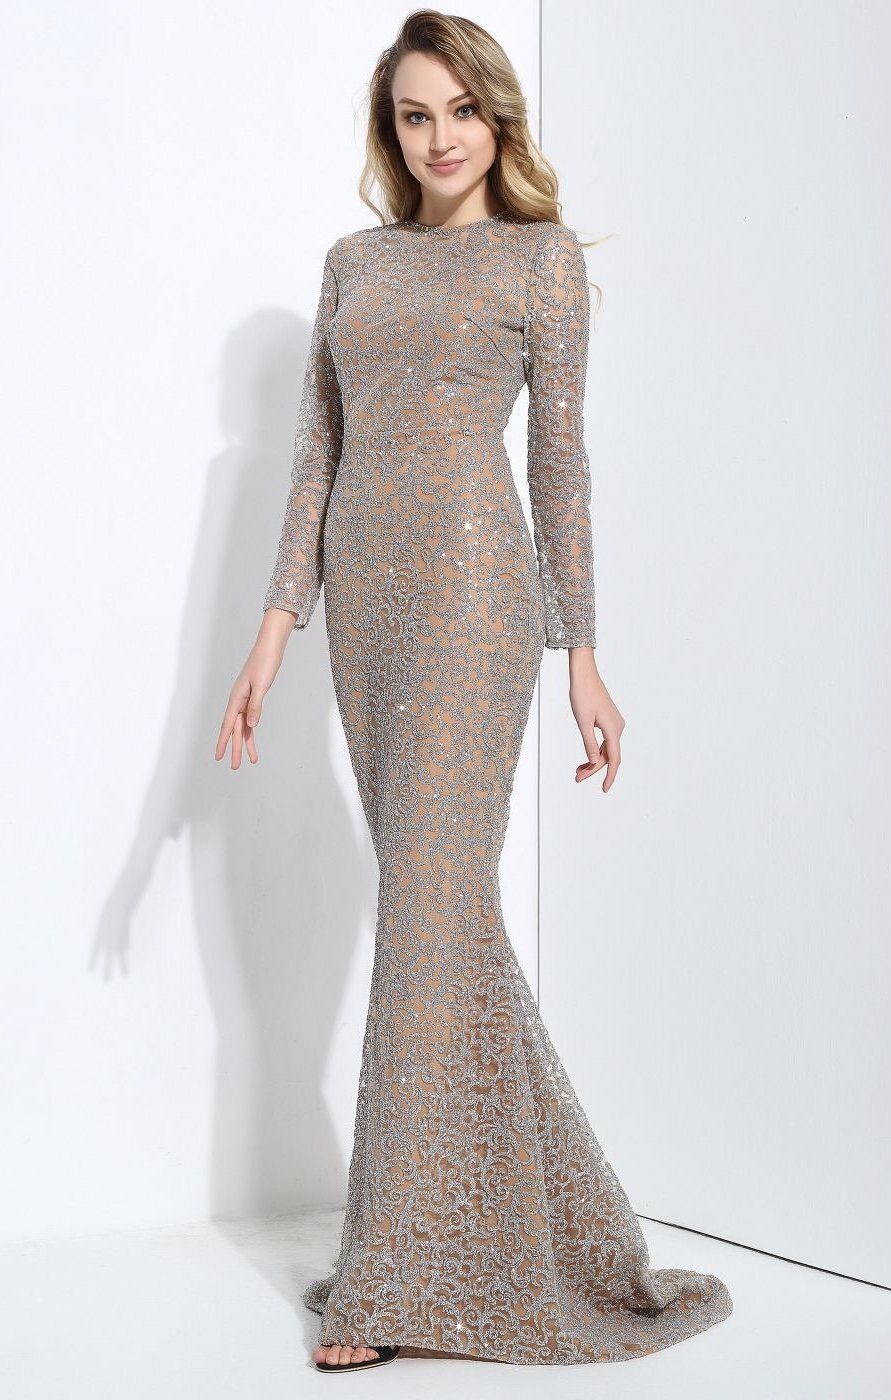 Allure Silver Glitter Embellished Long Sleeve Fishtail Maxi Dress in ... 54e75b2eb897